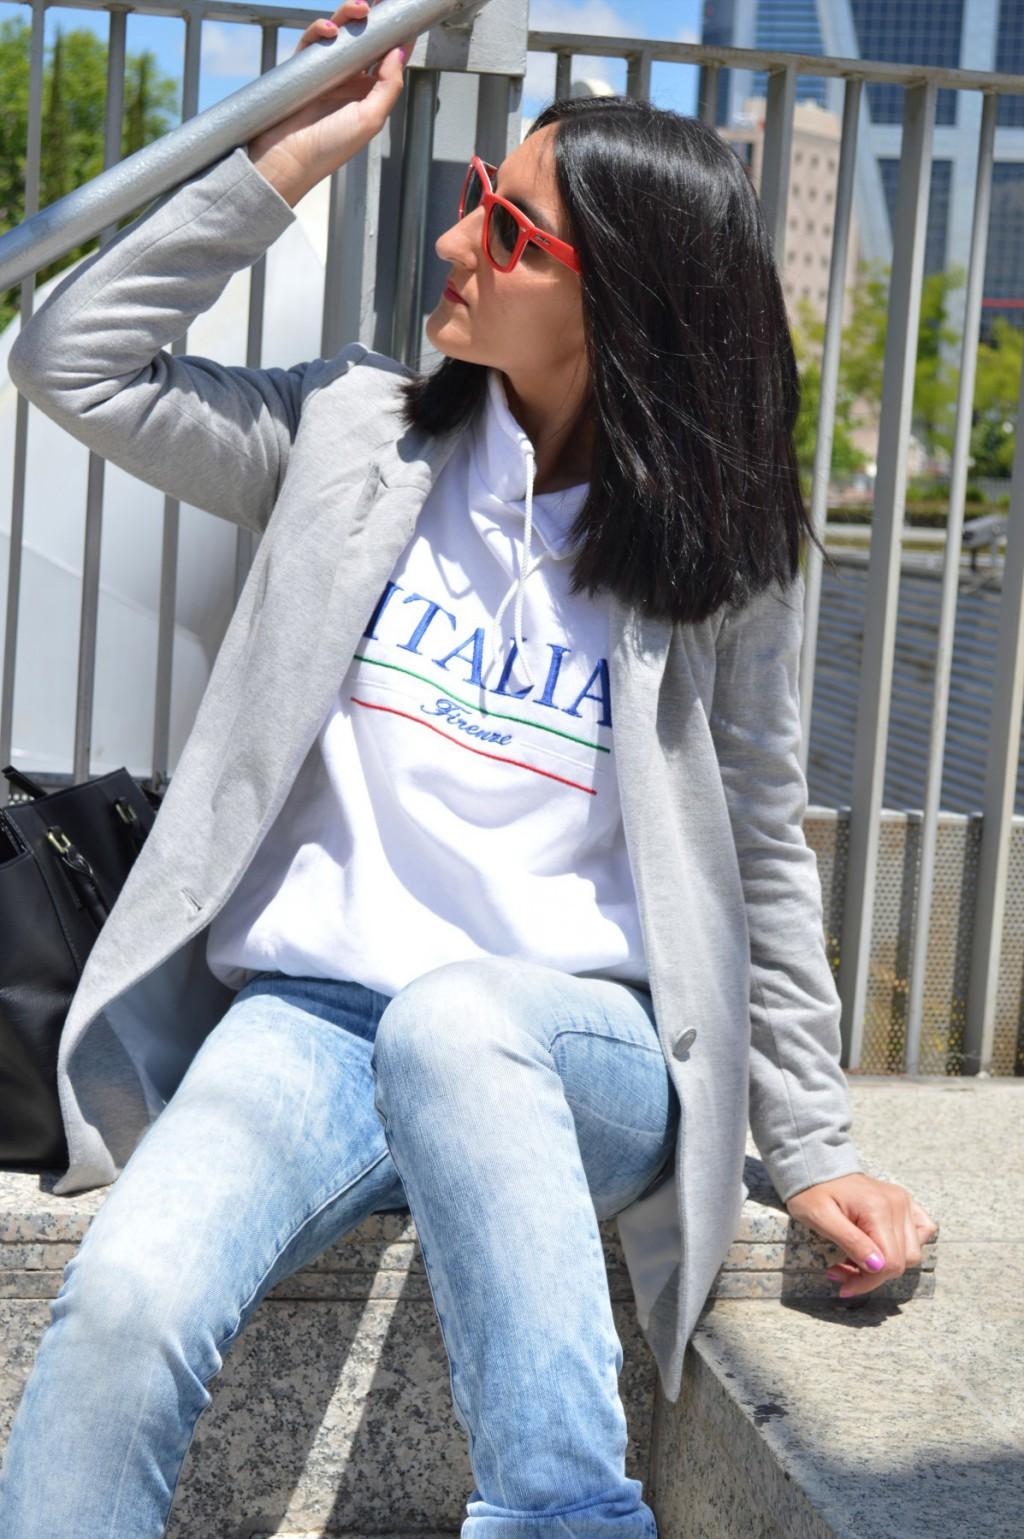 Blazer: Stradivarius (old) Jeans: Salsa jeans Sudadera / sweatshirt: vintage by Italy local store Sneakers: h&m (new) Bolso / bag: h&m Gafas de sol / sunglasses: Wayfarer ray ban